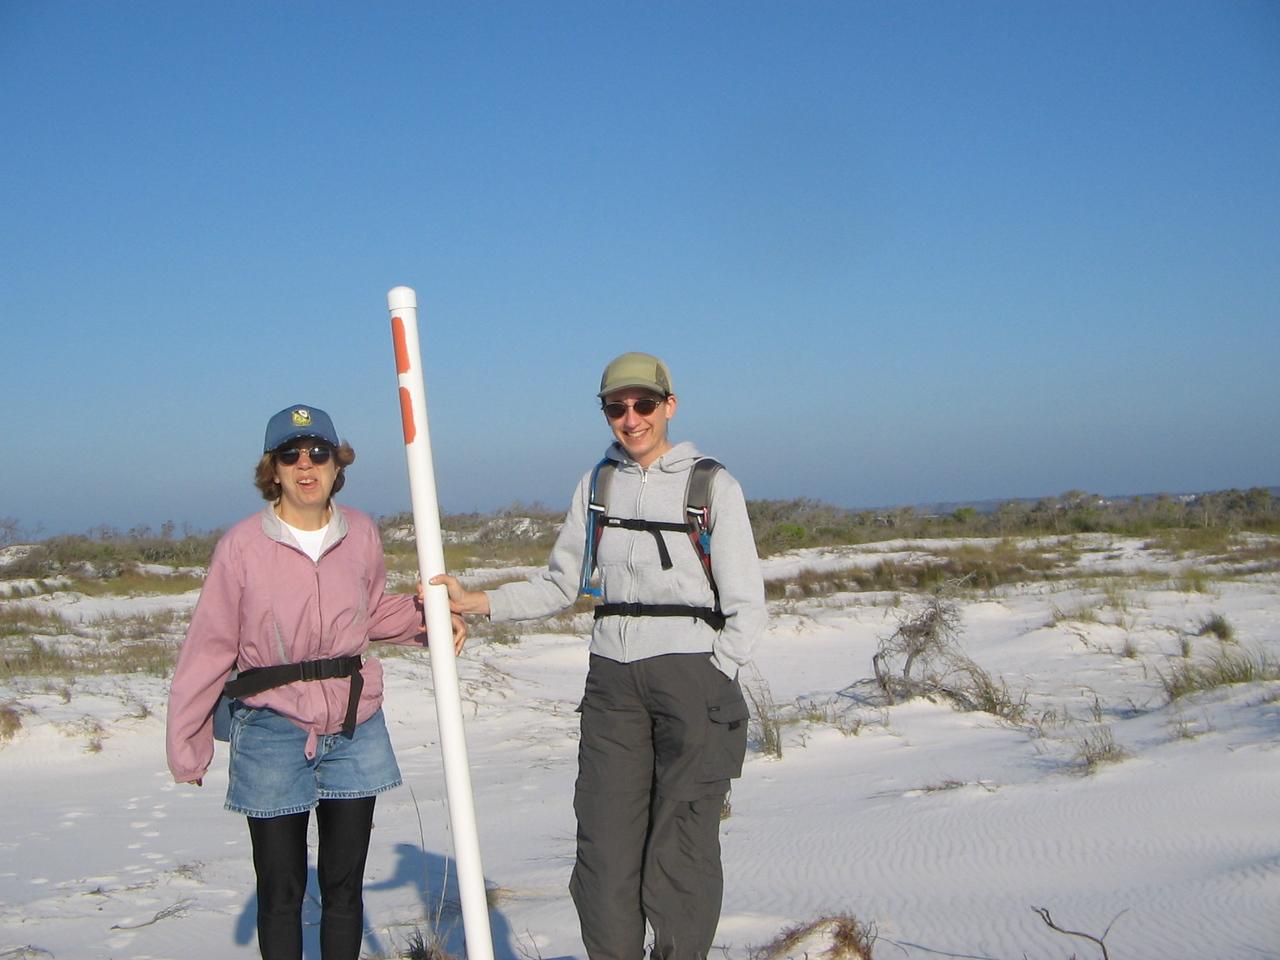 Panhandle Trace Hike, Santa Rosa Island<br /> PHOTO CREDIT: Peggy Grantham / Florida Trail Association